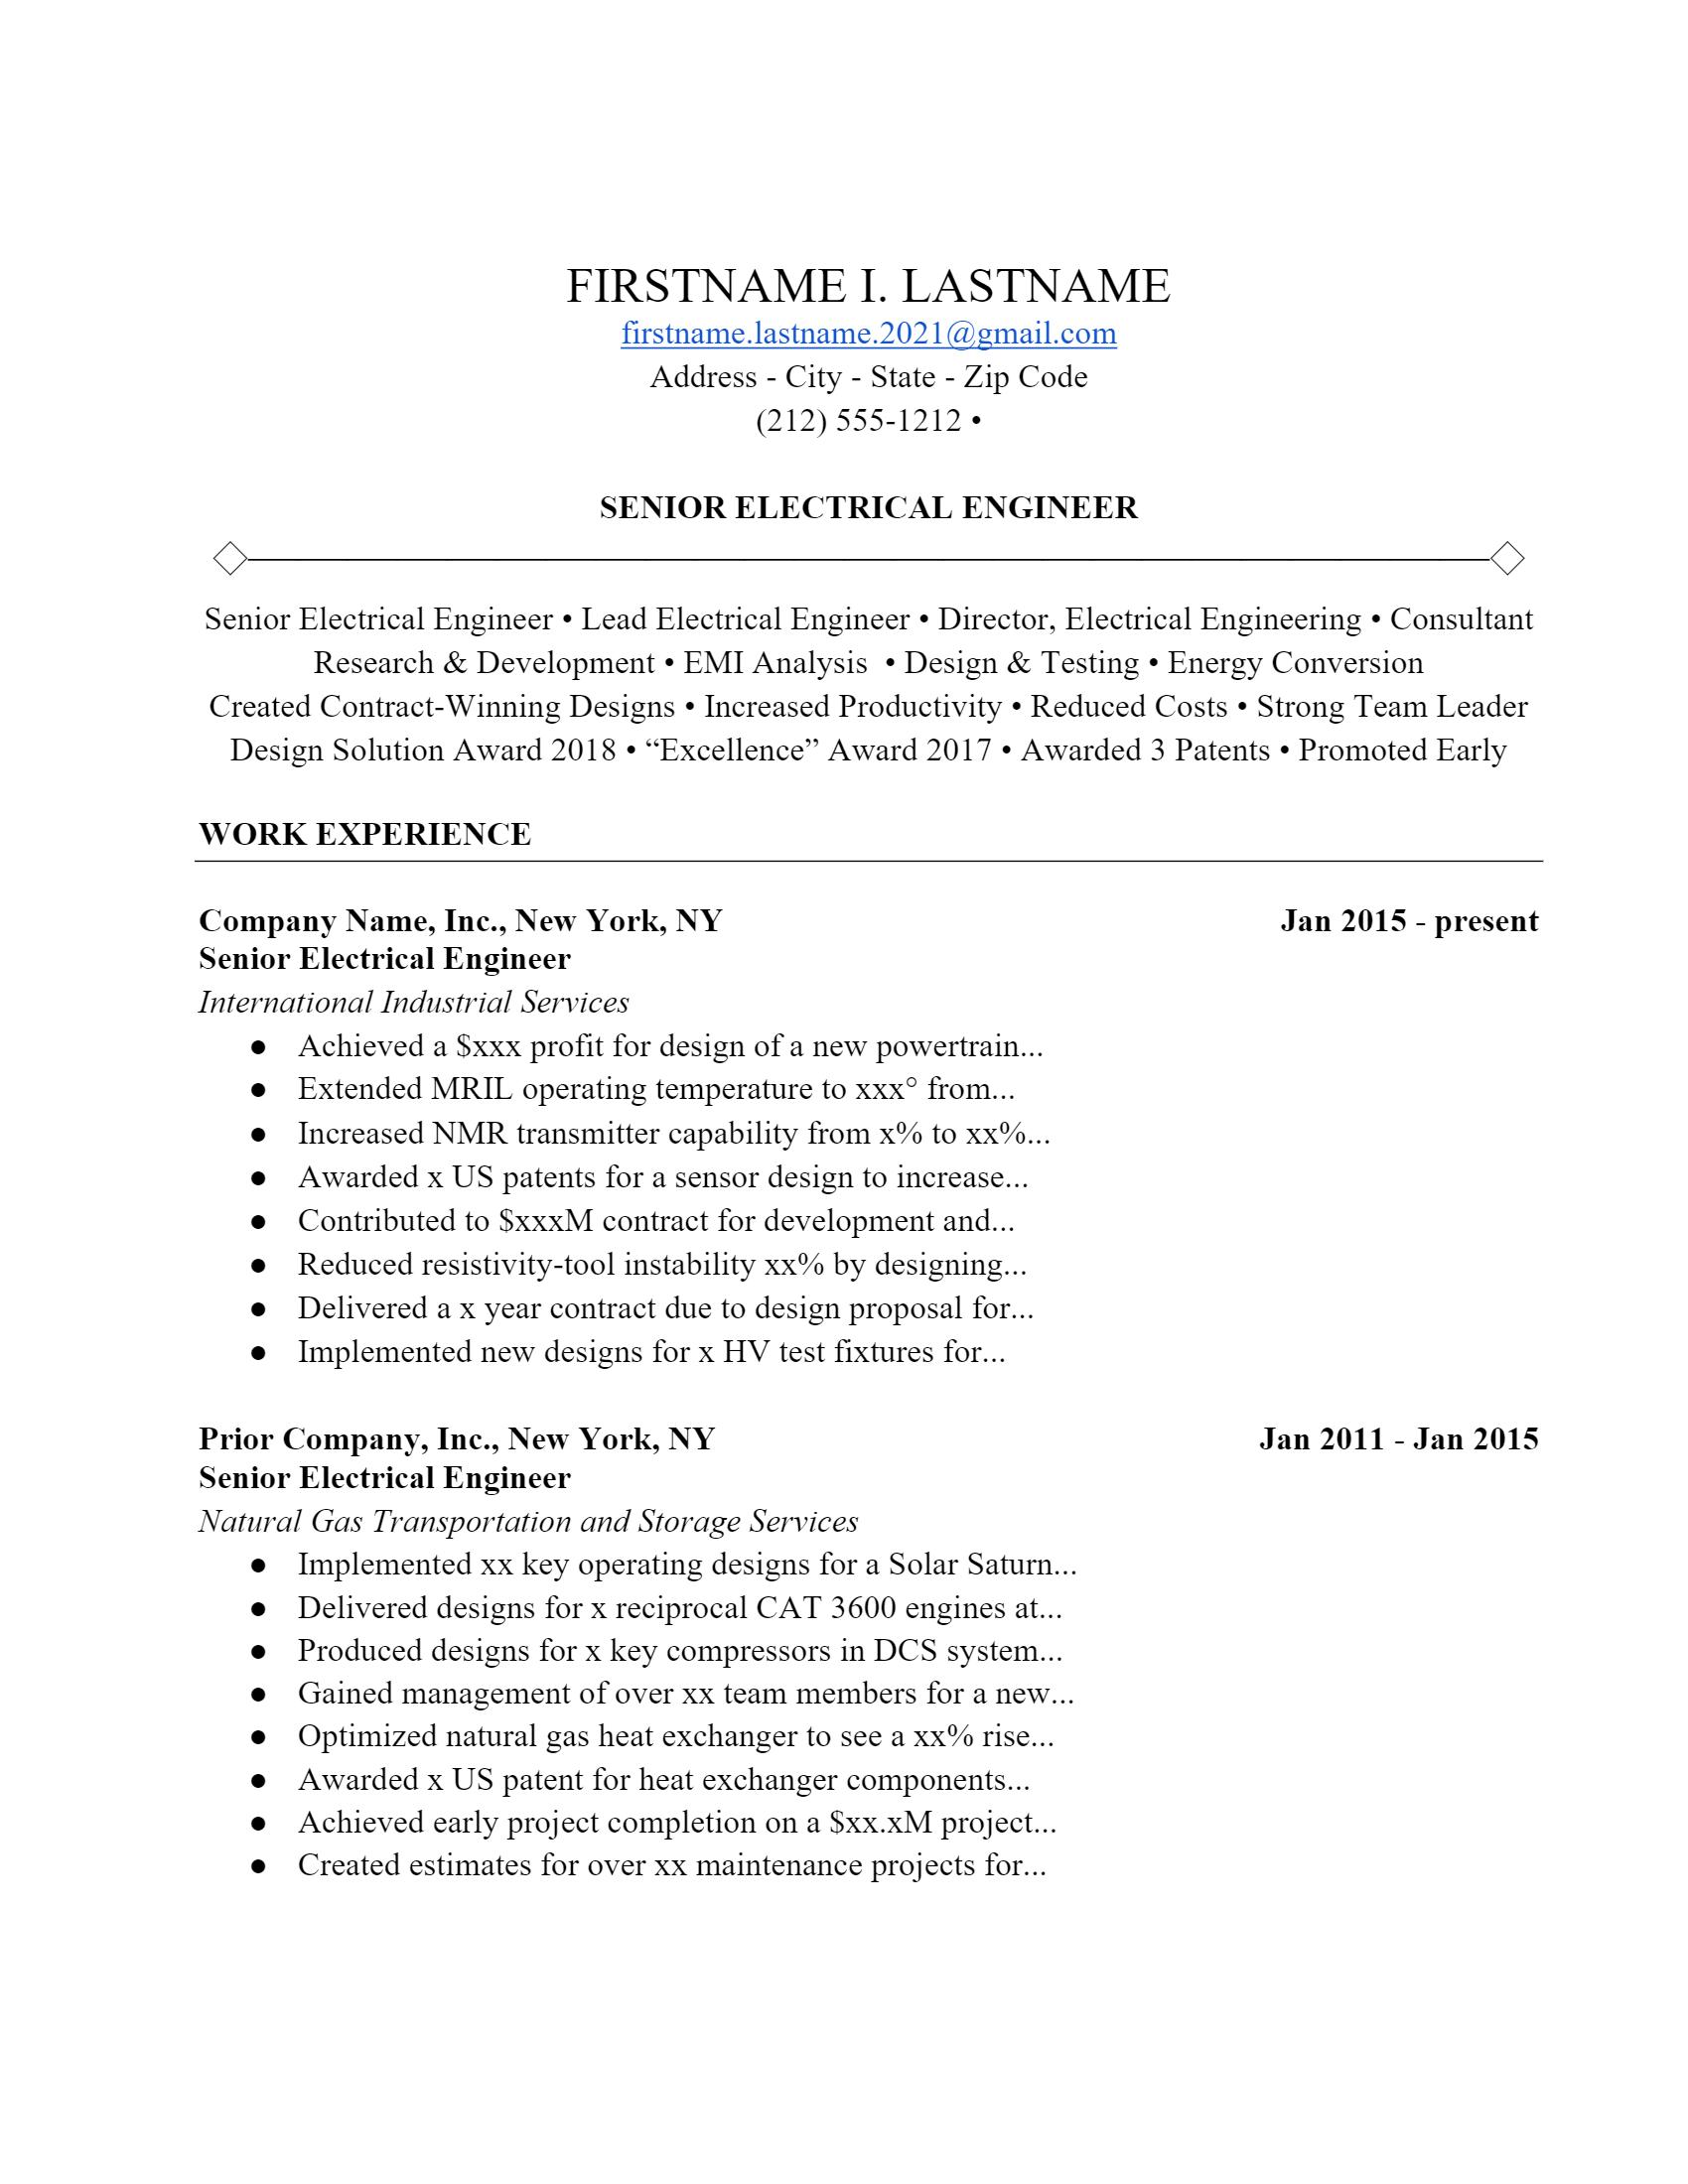 Electrical Engineer Resume > Electrical Engineer Resume .Docx (Word)